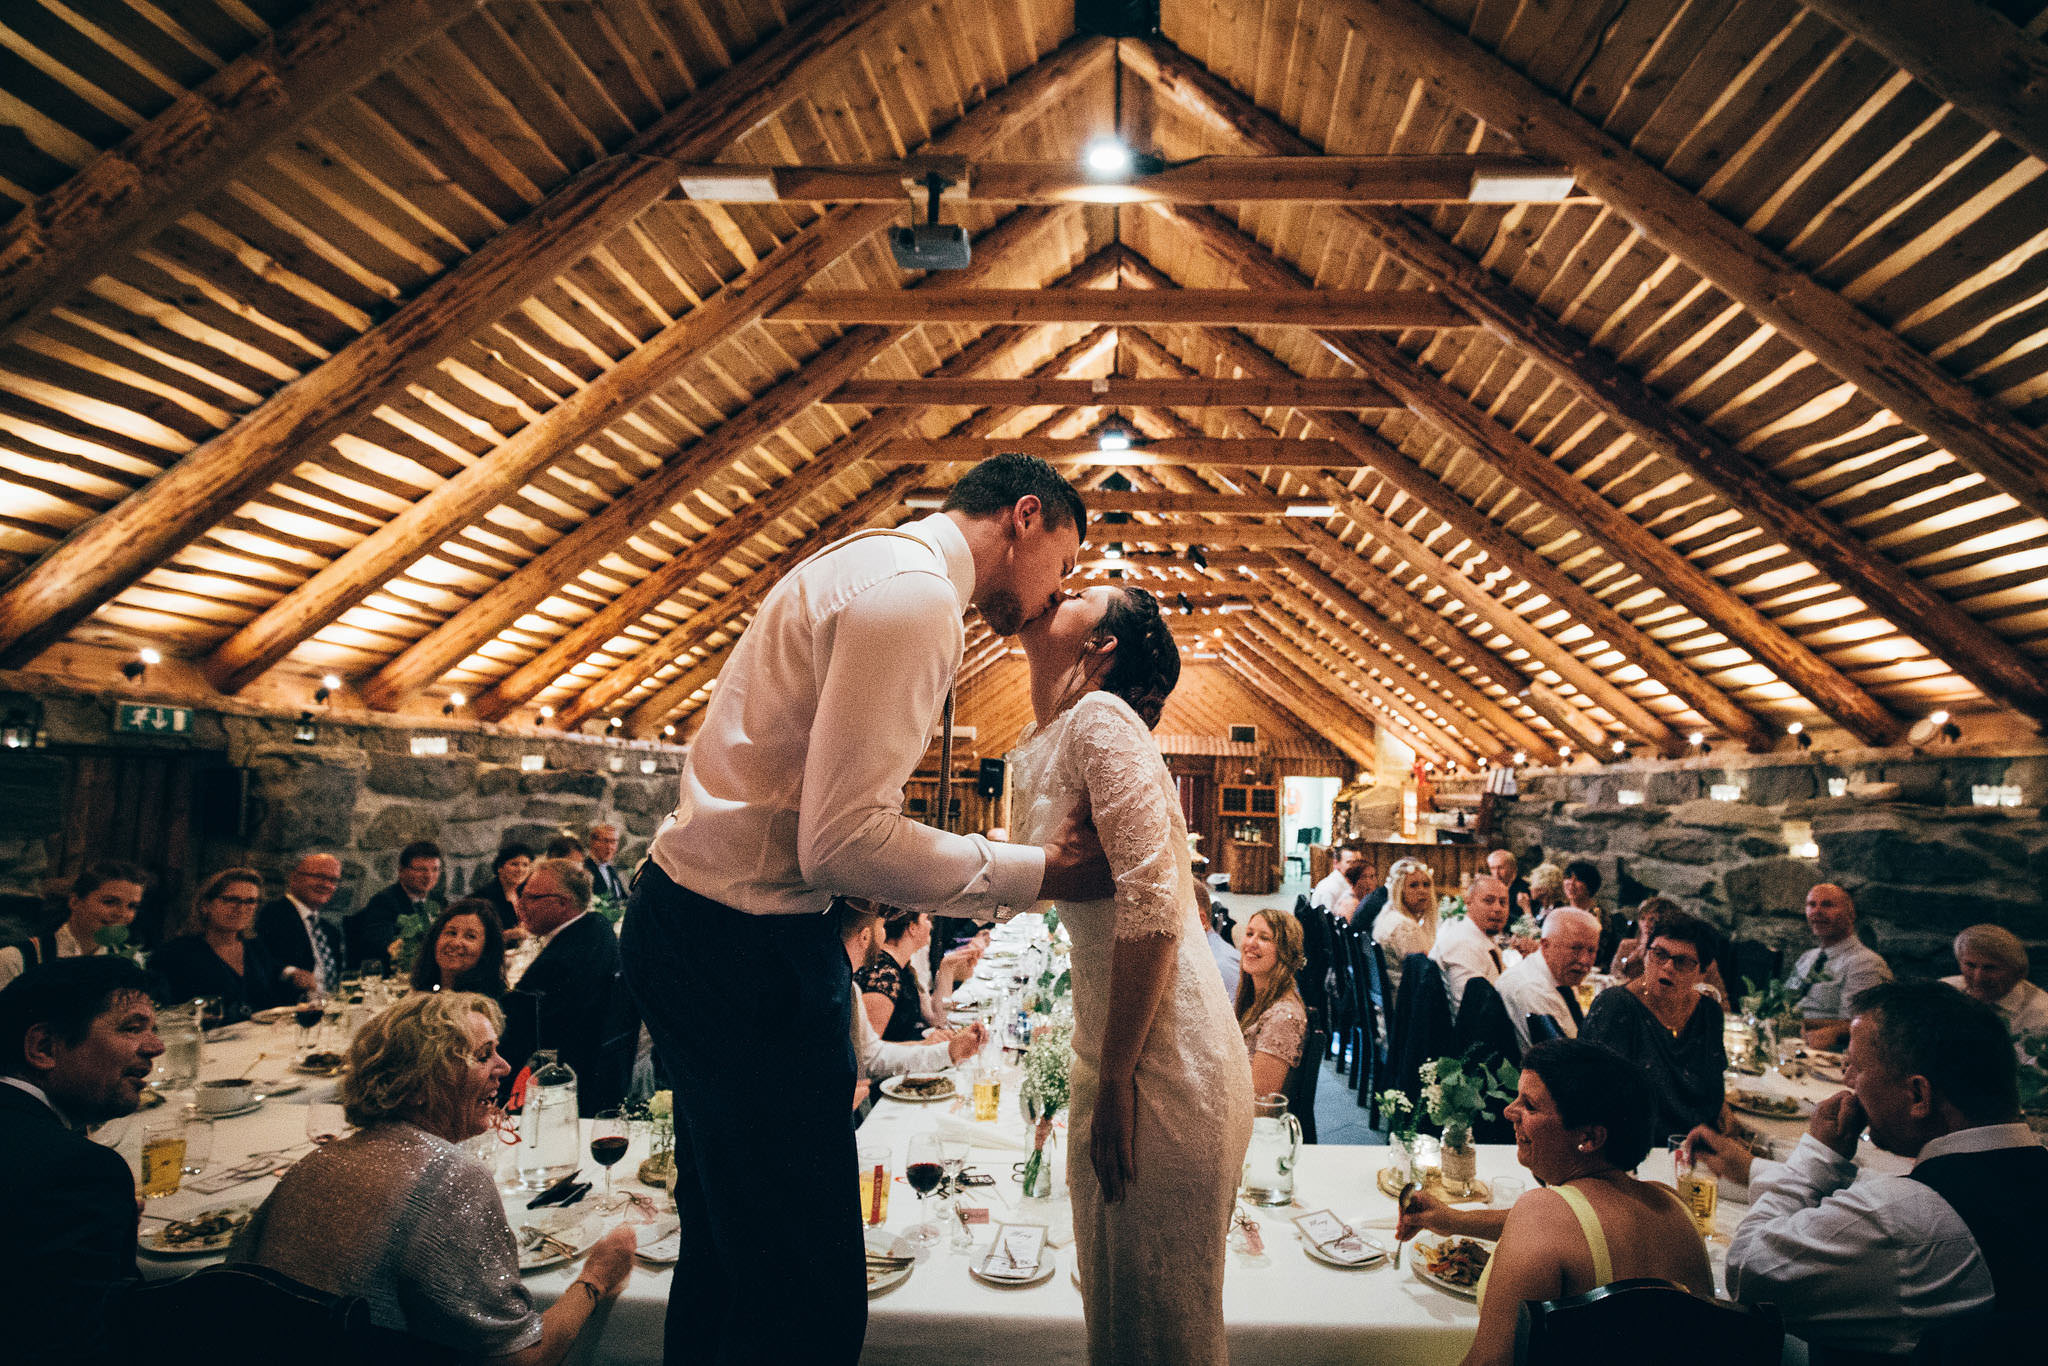 Norway+wedding+photographer+elopement+pre+wedding+Casey+Arneson-108.jpg